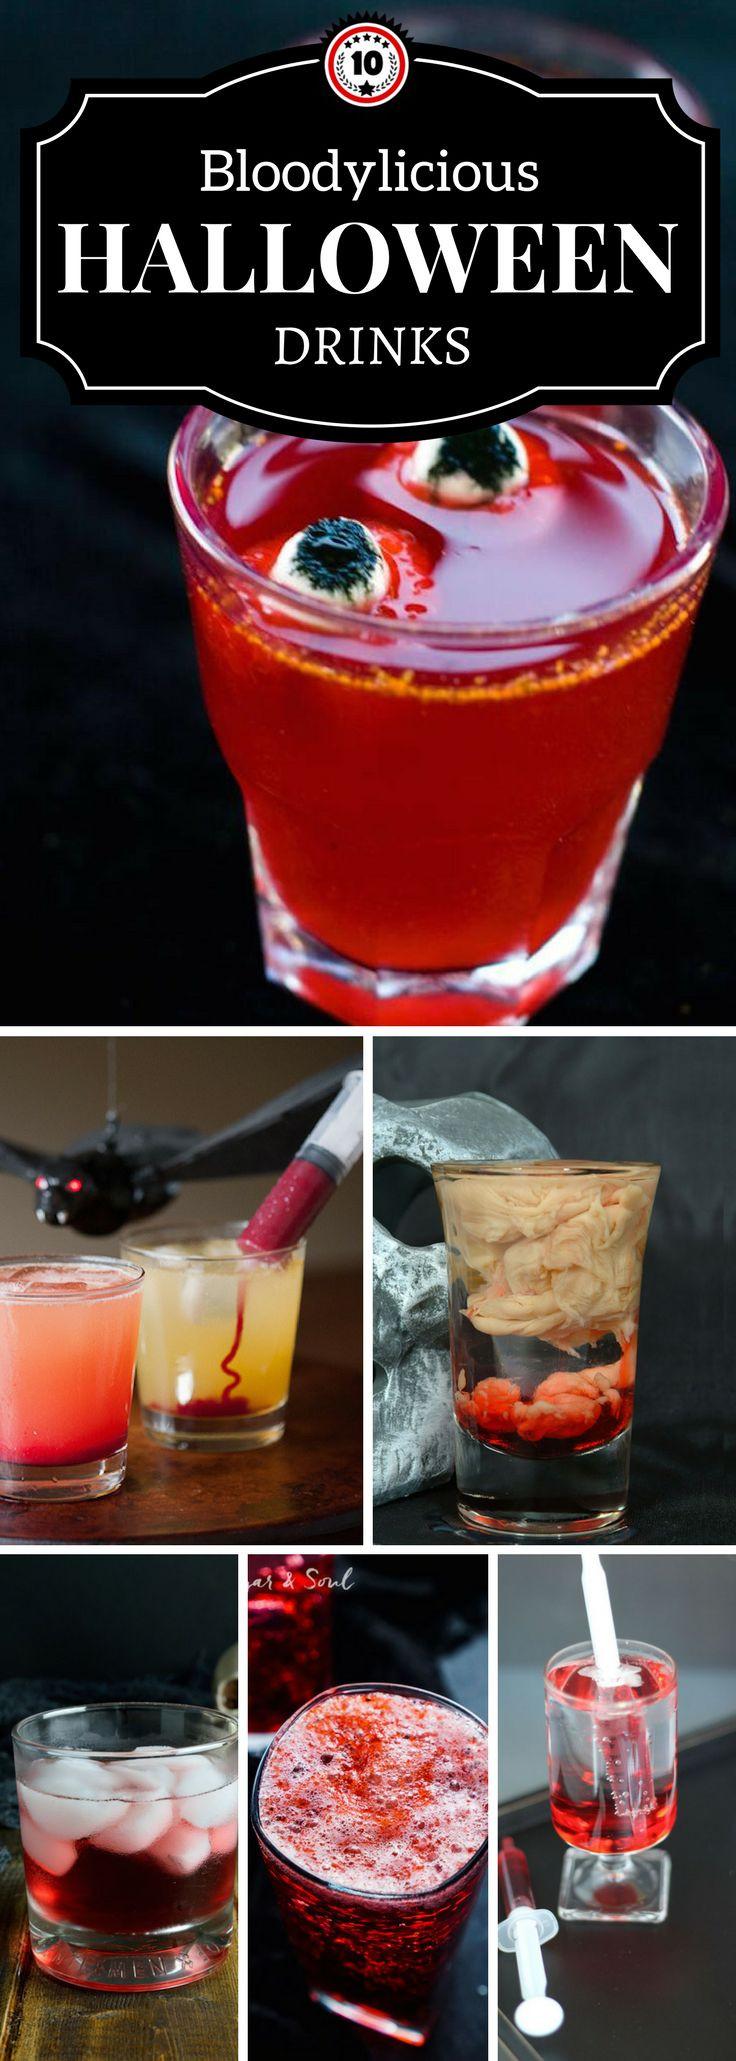 Halloween Drinks Recipes  Best 25 Halloween drinks ideas on Pinterest